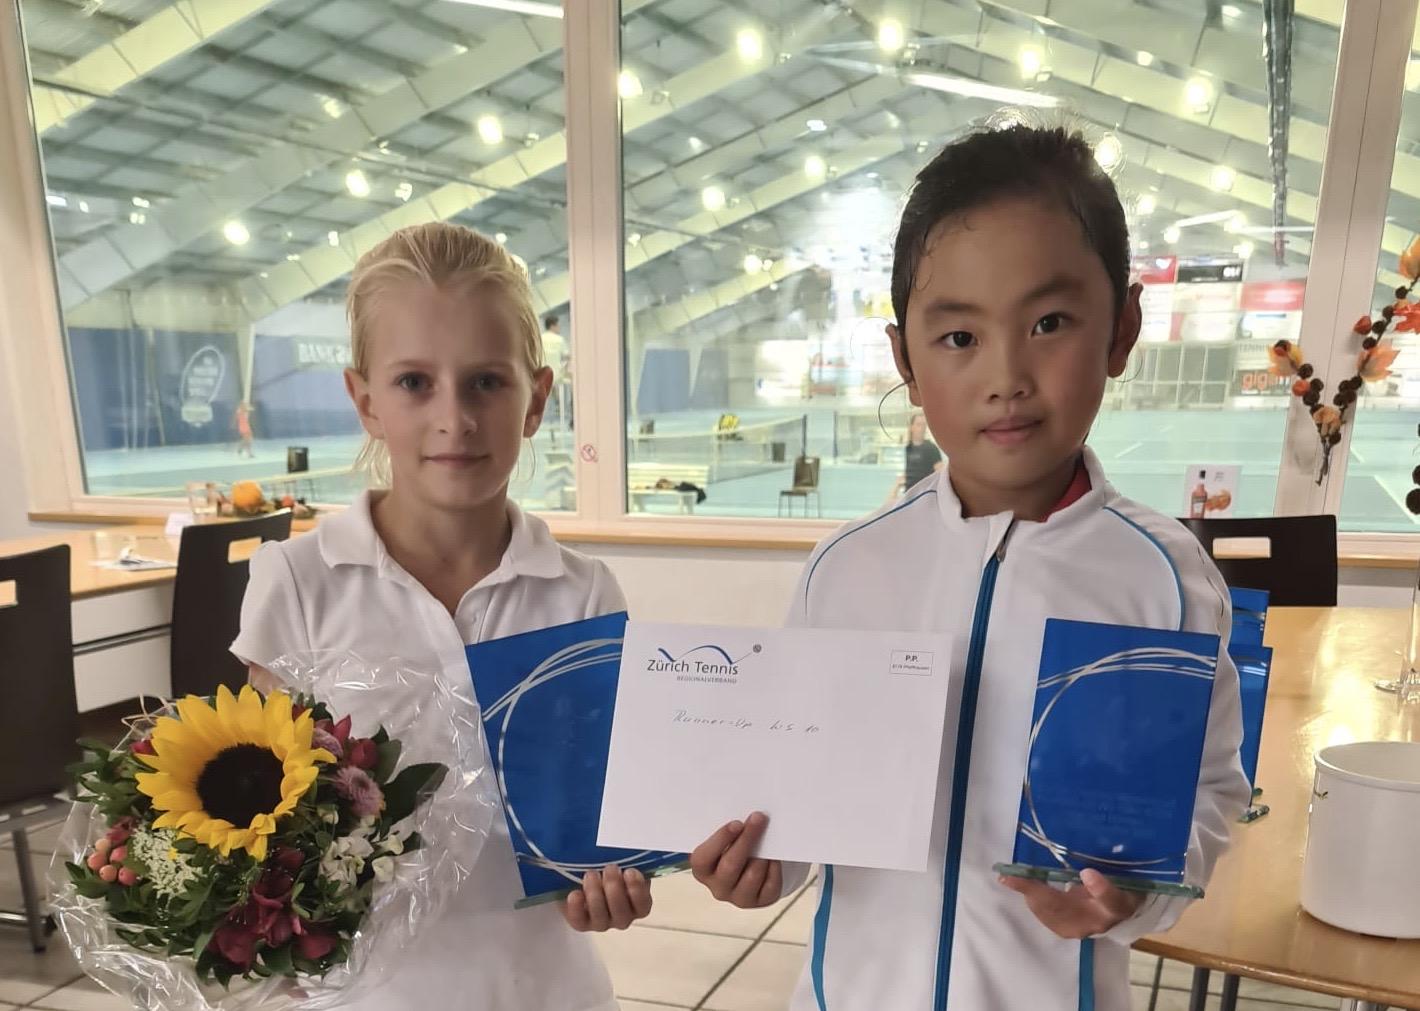 05.09.2020 Azra ist 10&U ZH Oberland Juniorenmeisterin